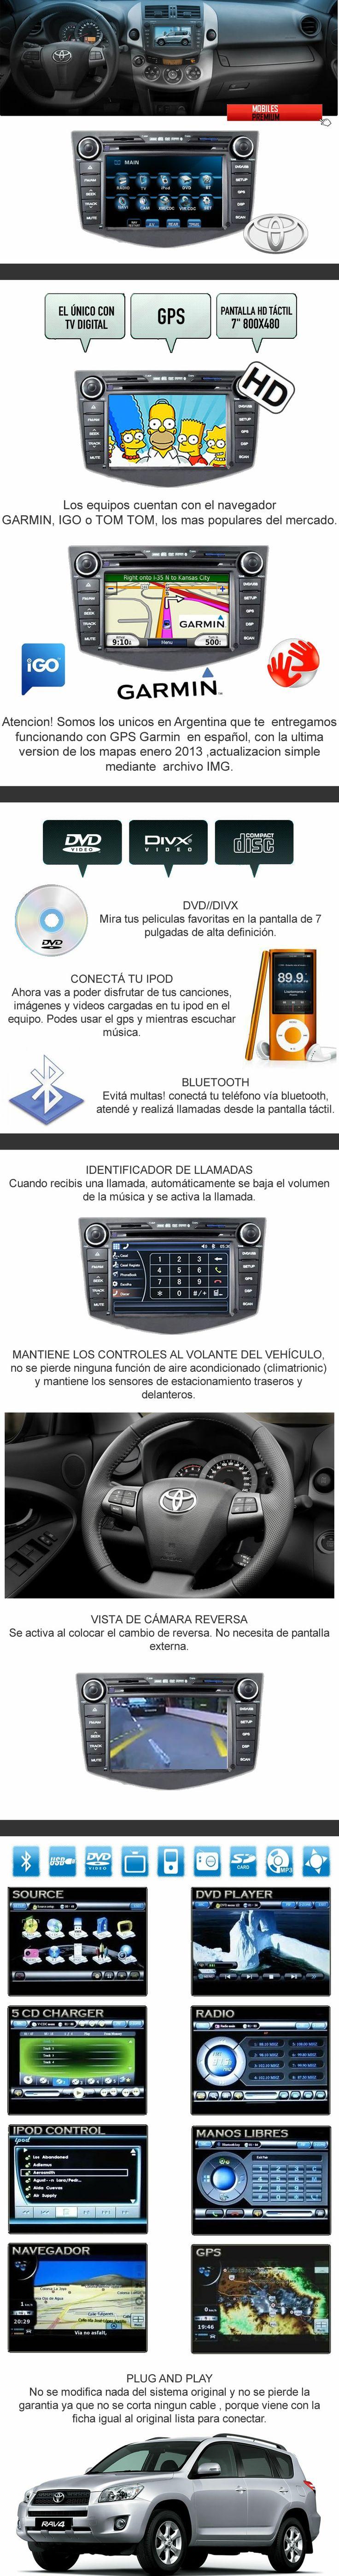 Comprar estereo multimedia toyota rav4 | venta de estereo multimedia toyota rav4 Argentina